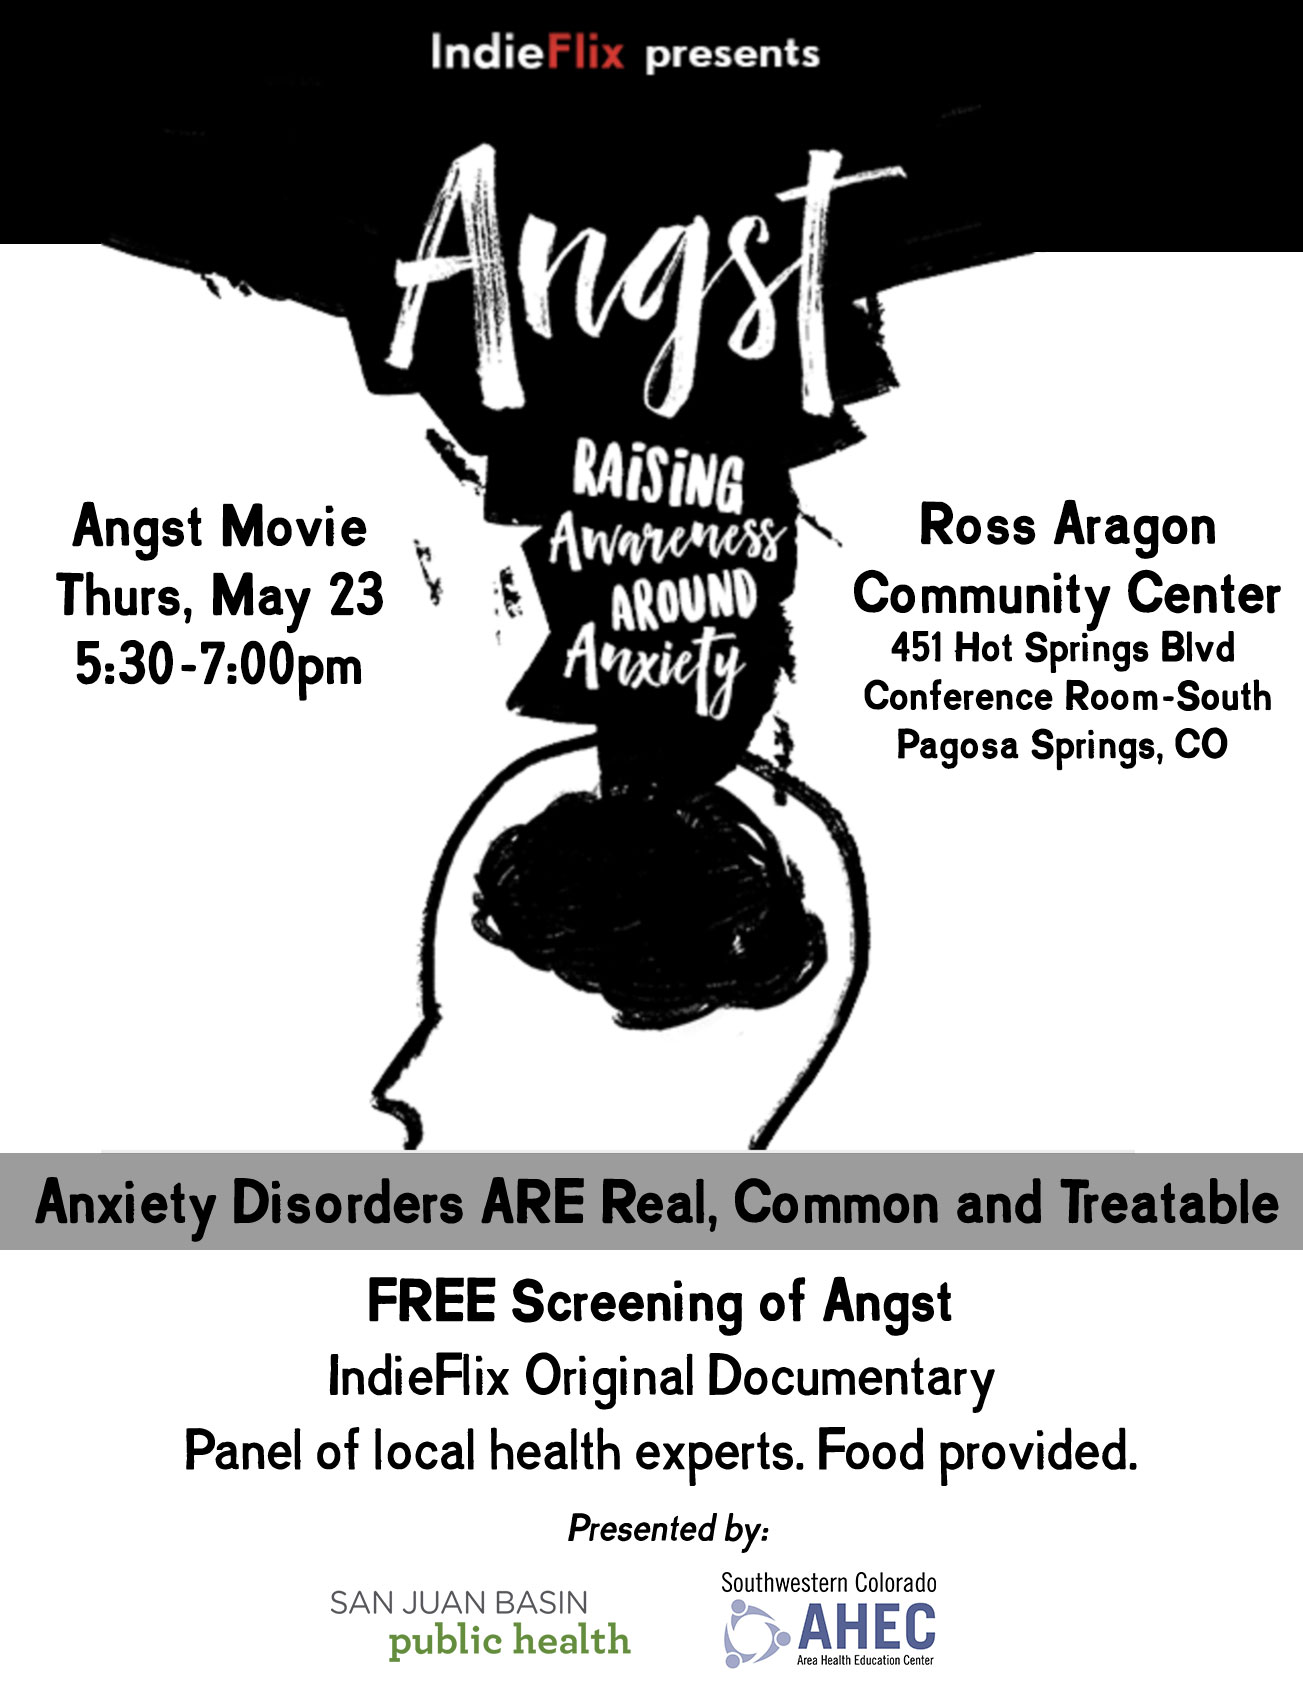 Angst-movie-flyer-(VS3)